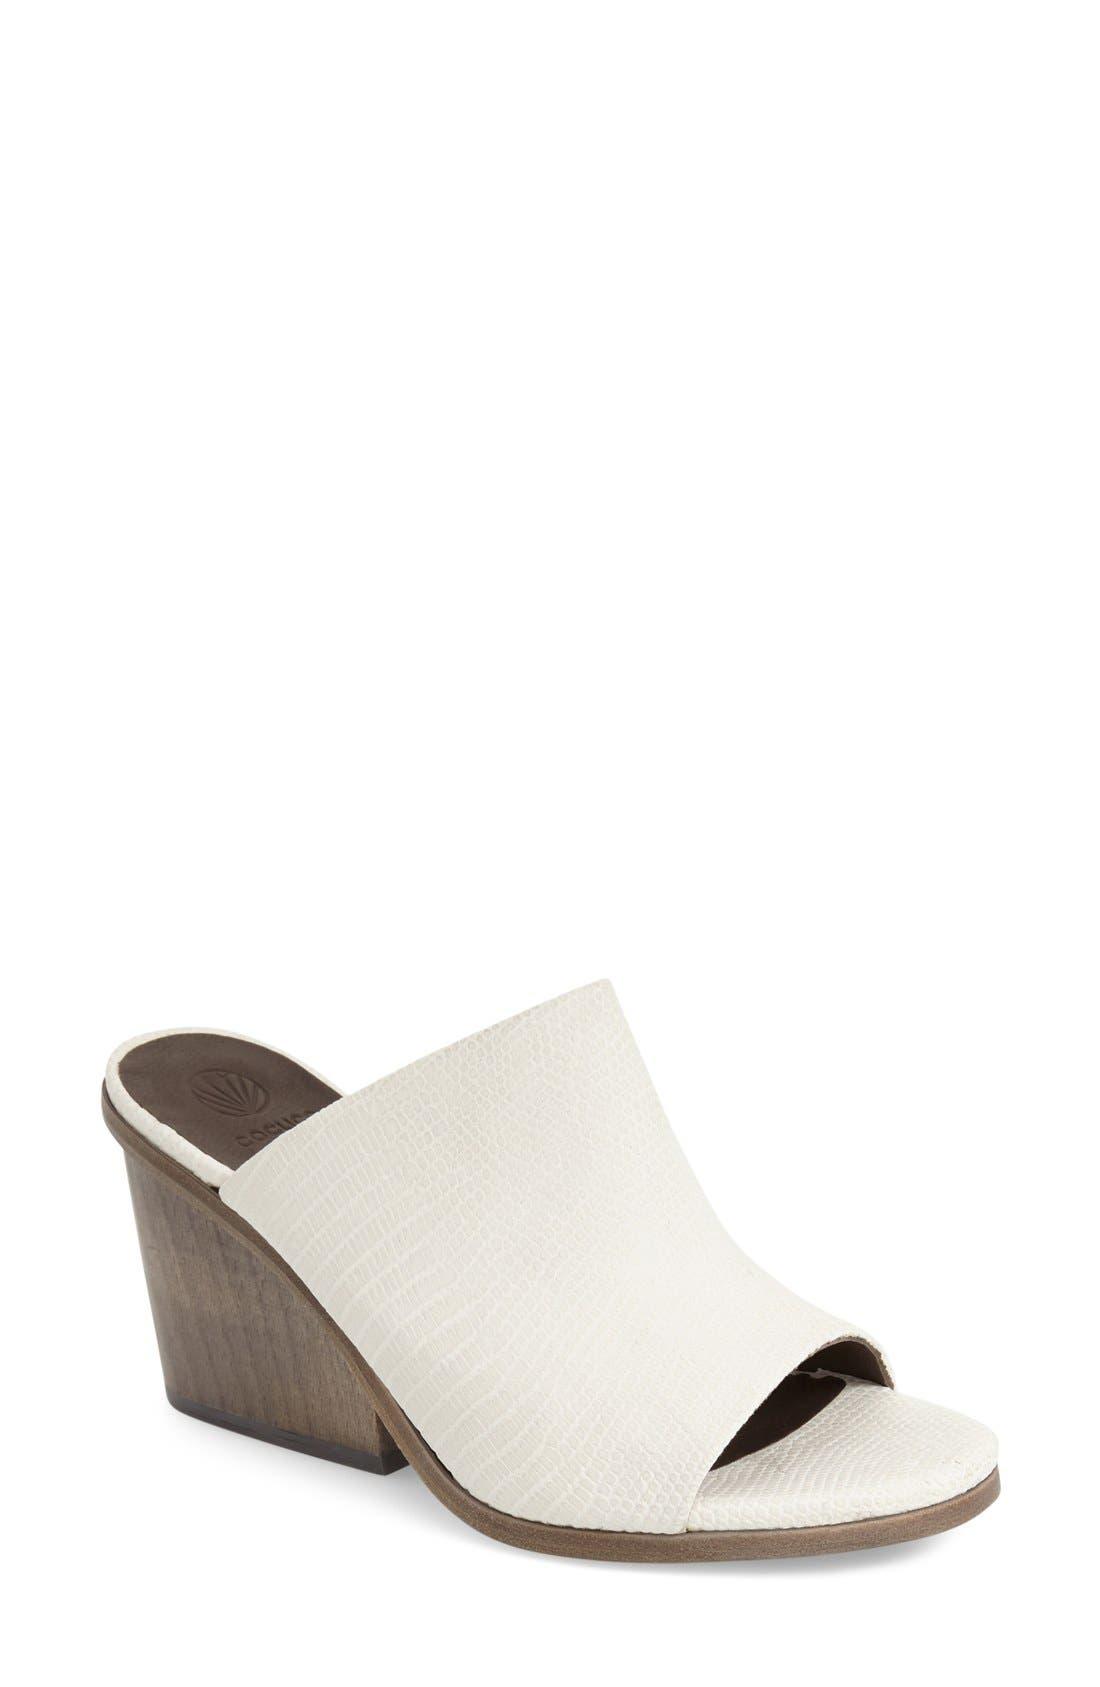 'Anemeg' Slide Sandal, Main, color, 109